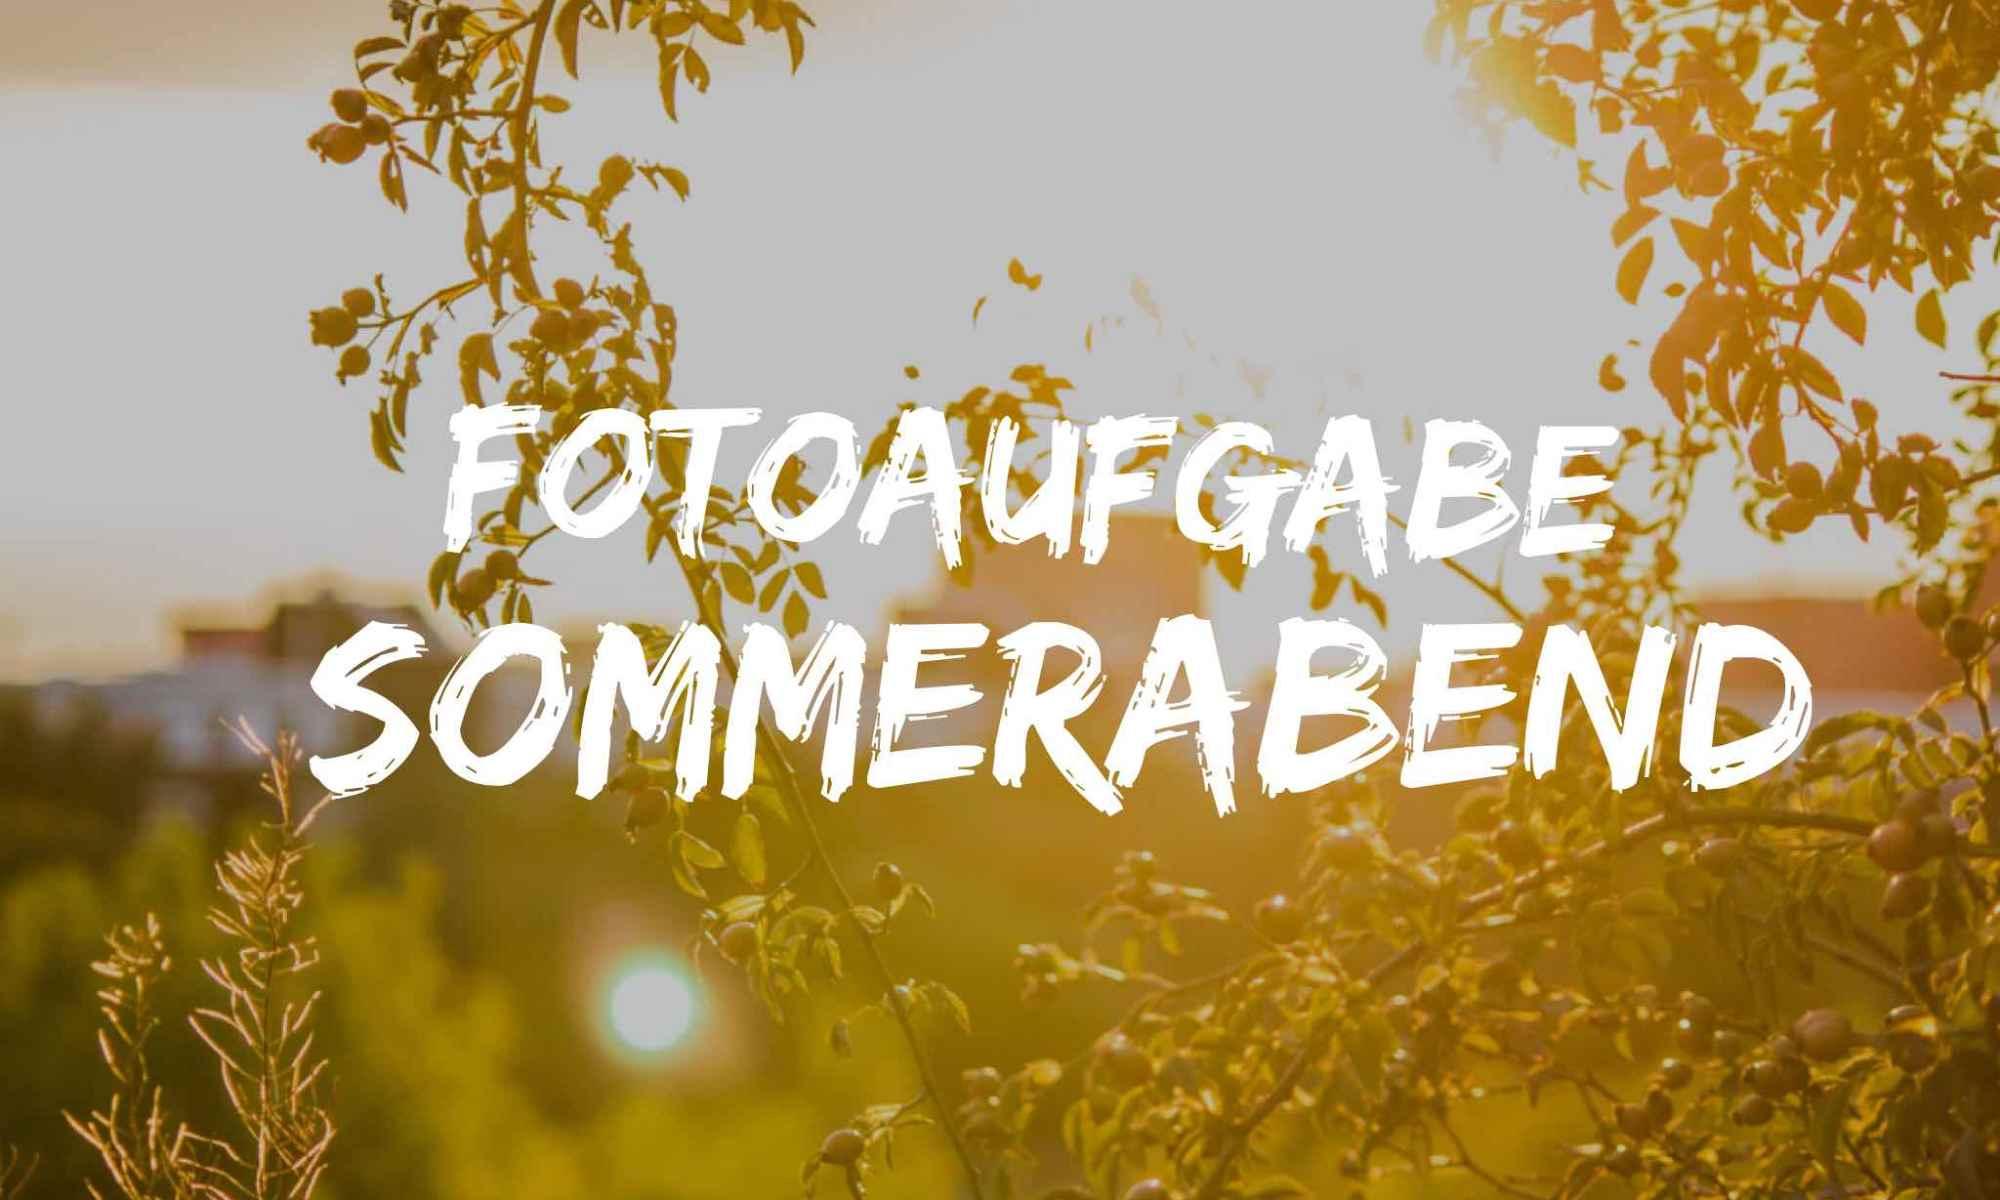 fotoaufgabe-sommerabend